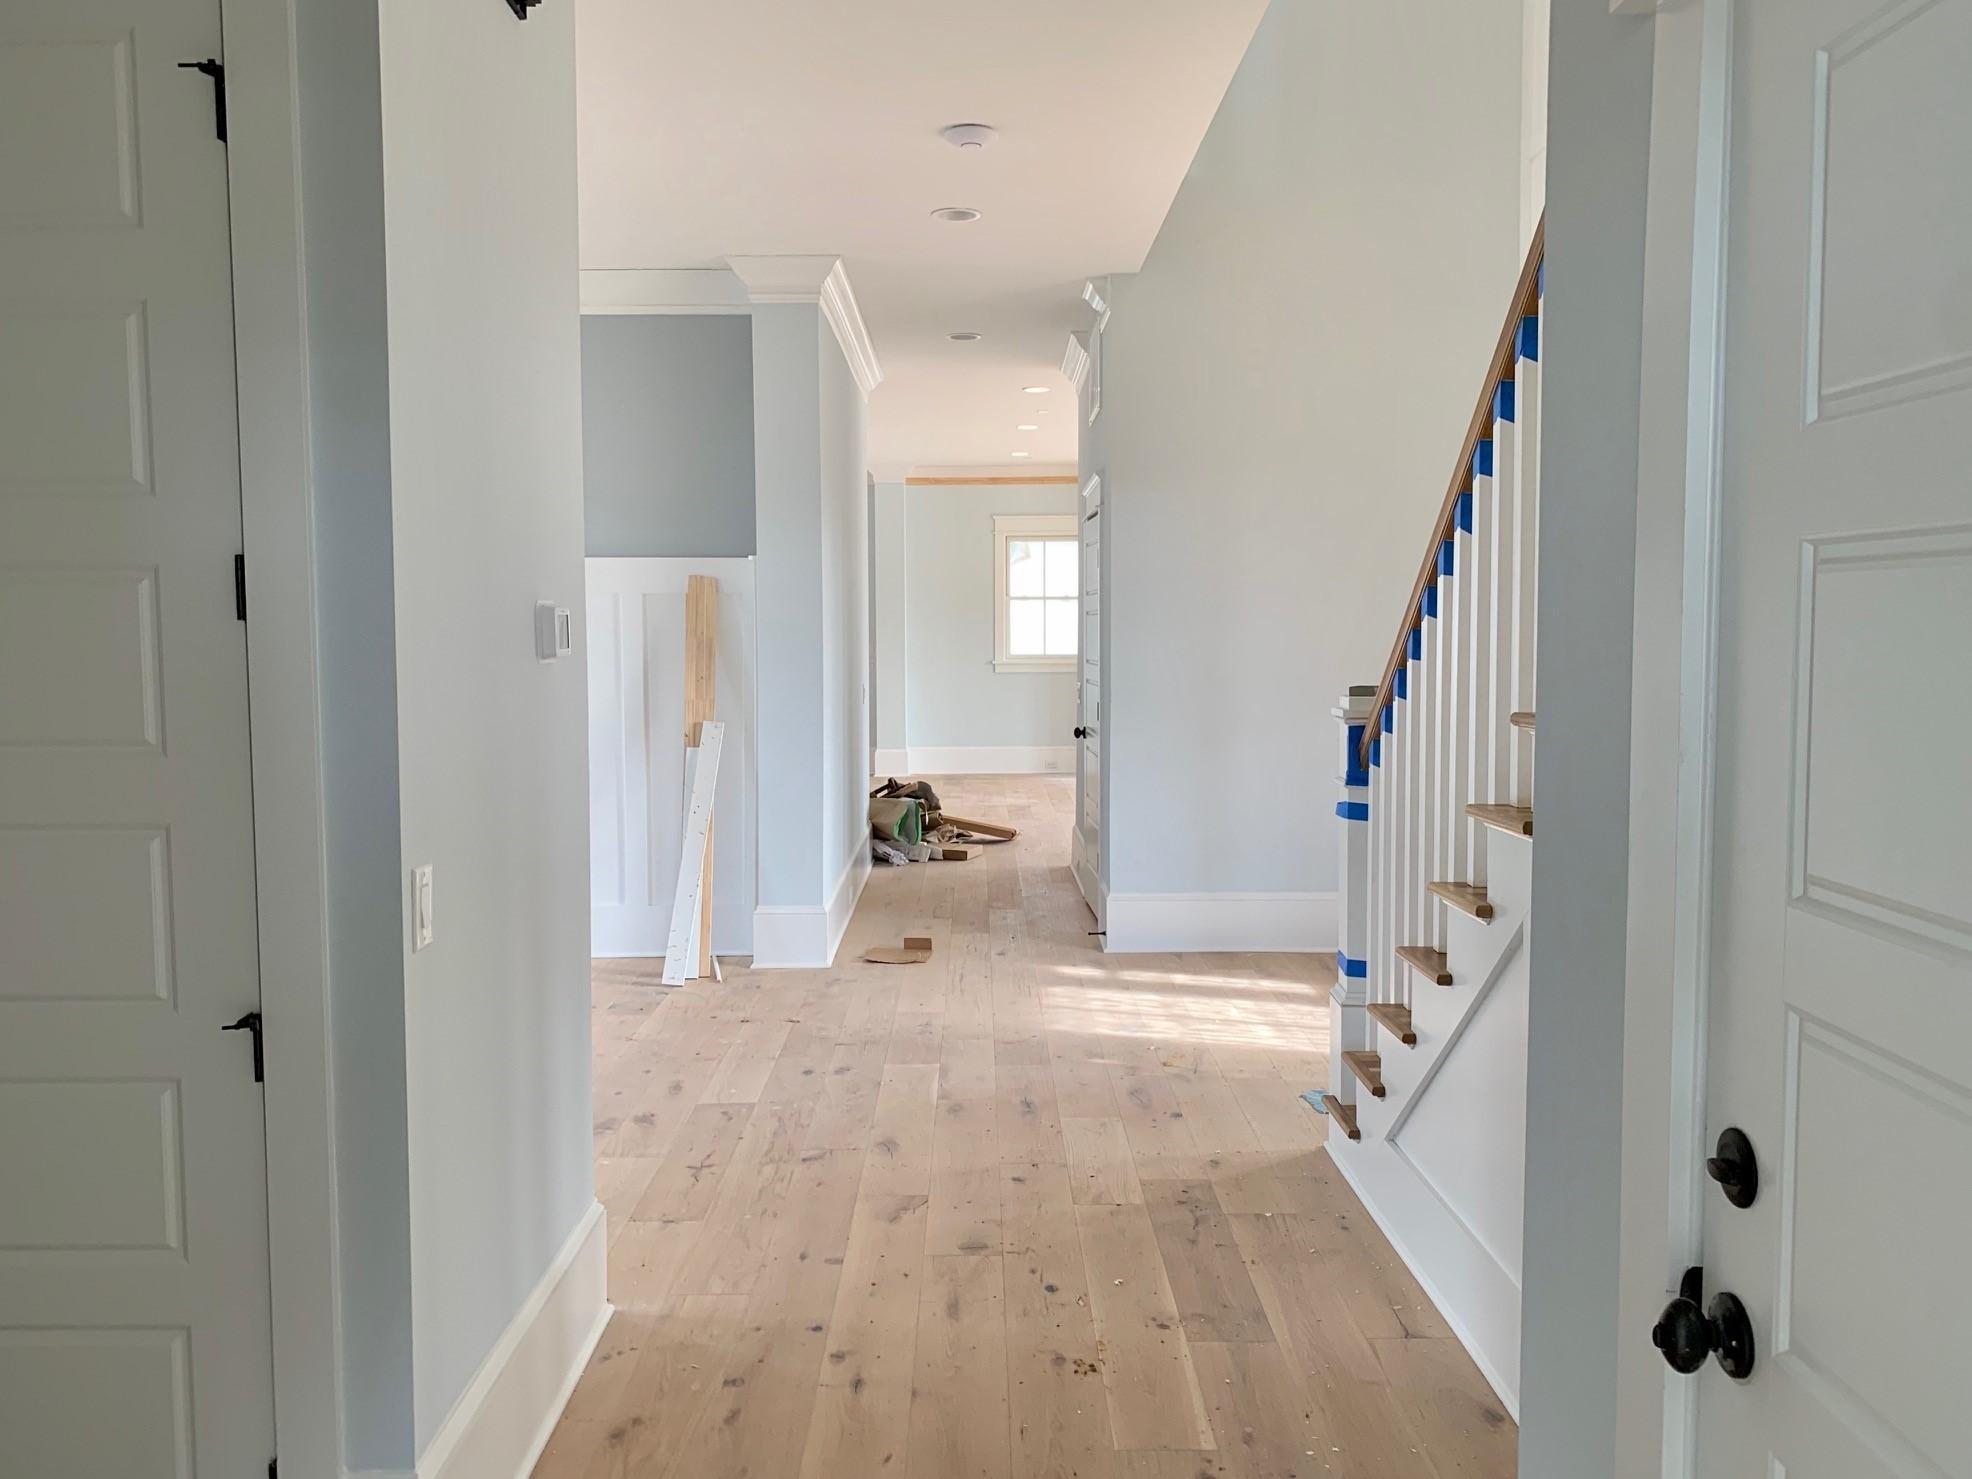 Daniel Island Homes For Sale - 206 Foundry, Charleston, SC - 16